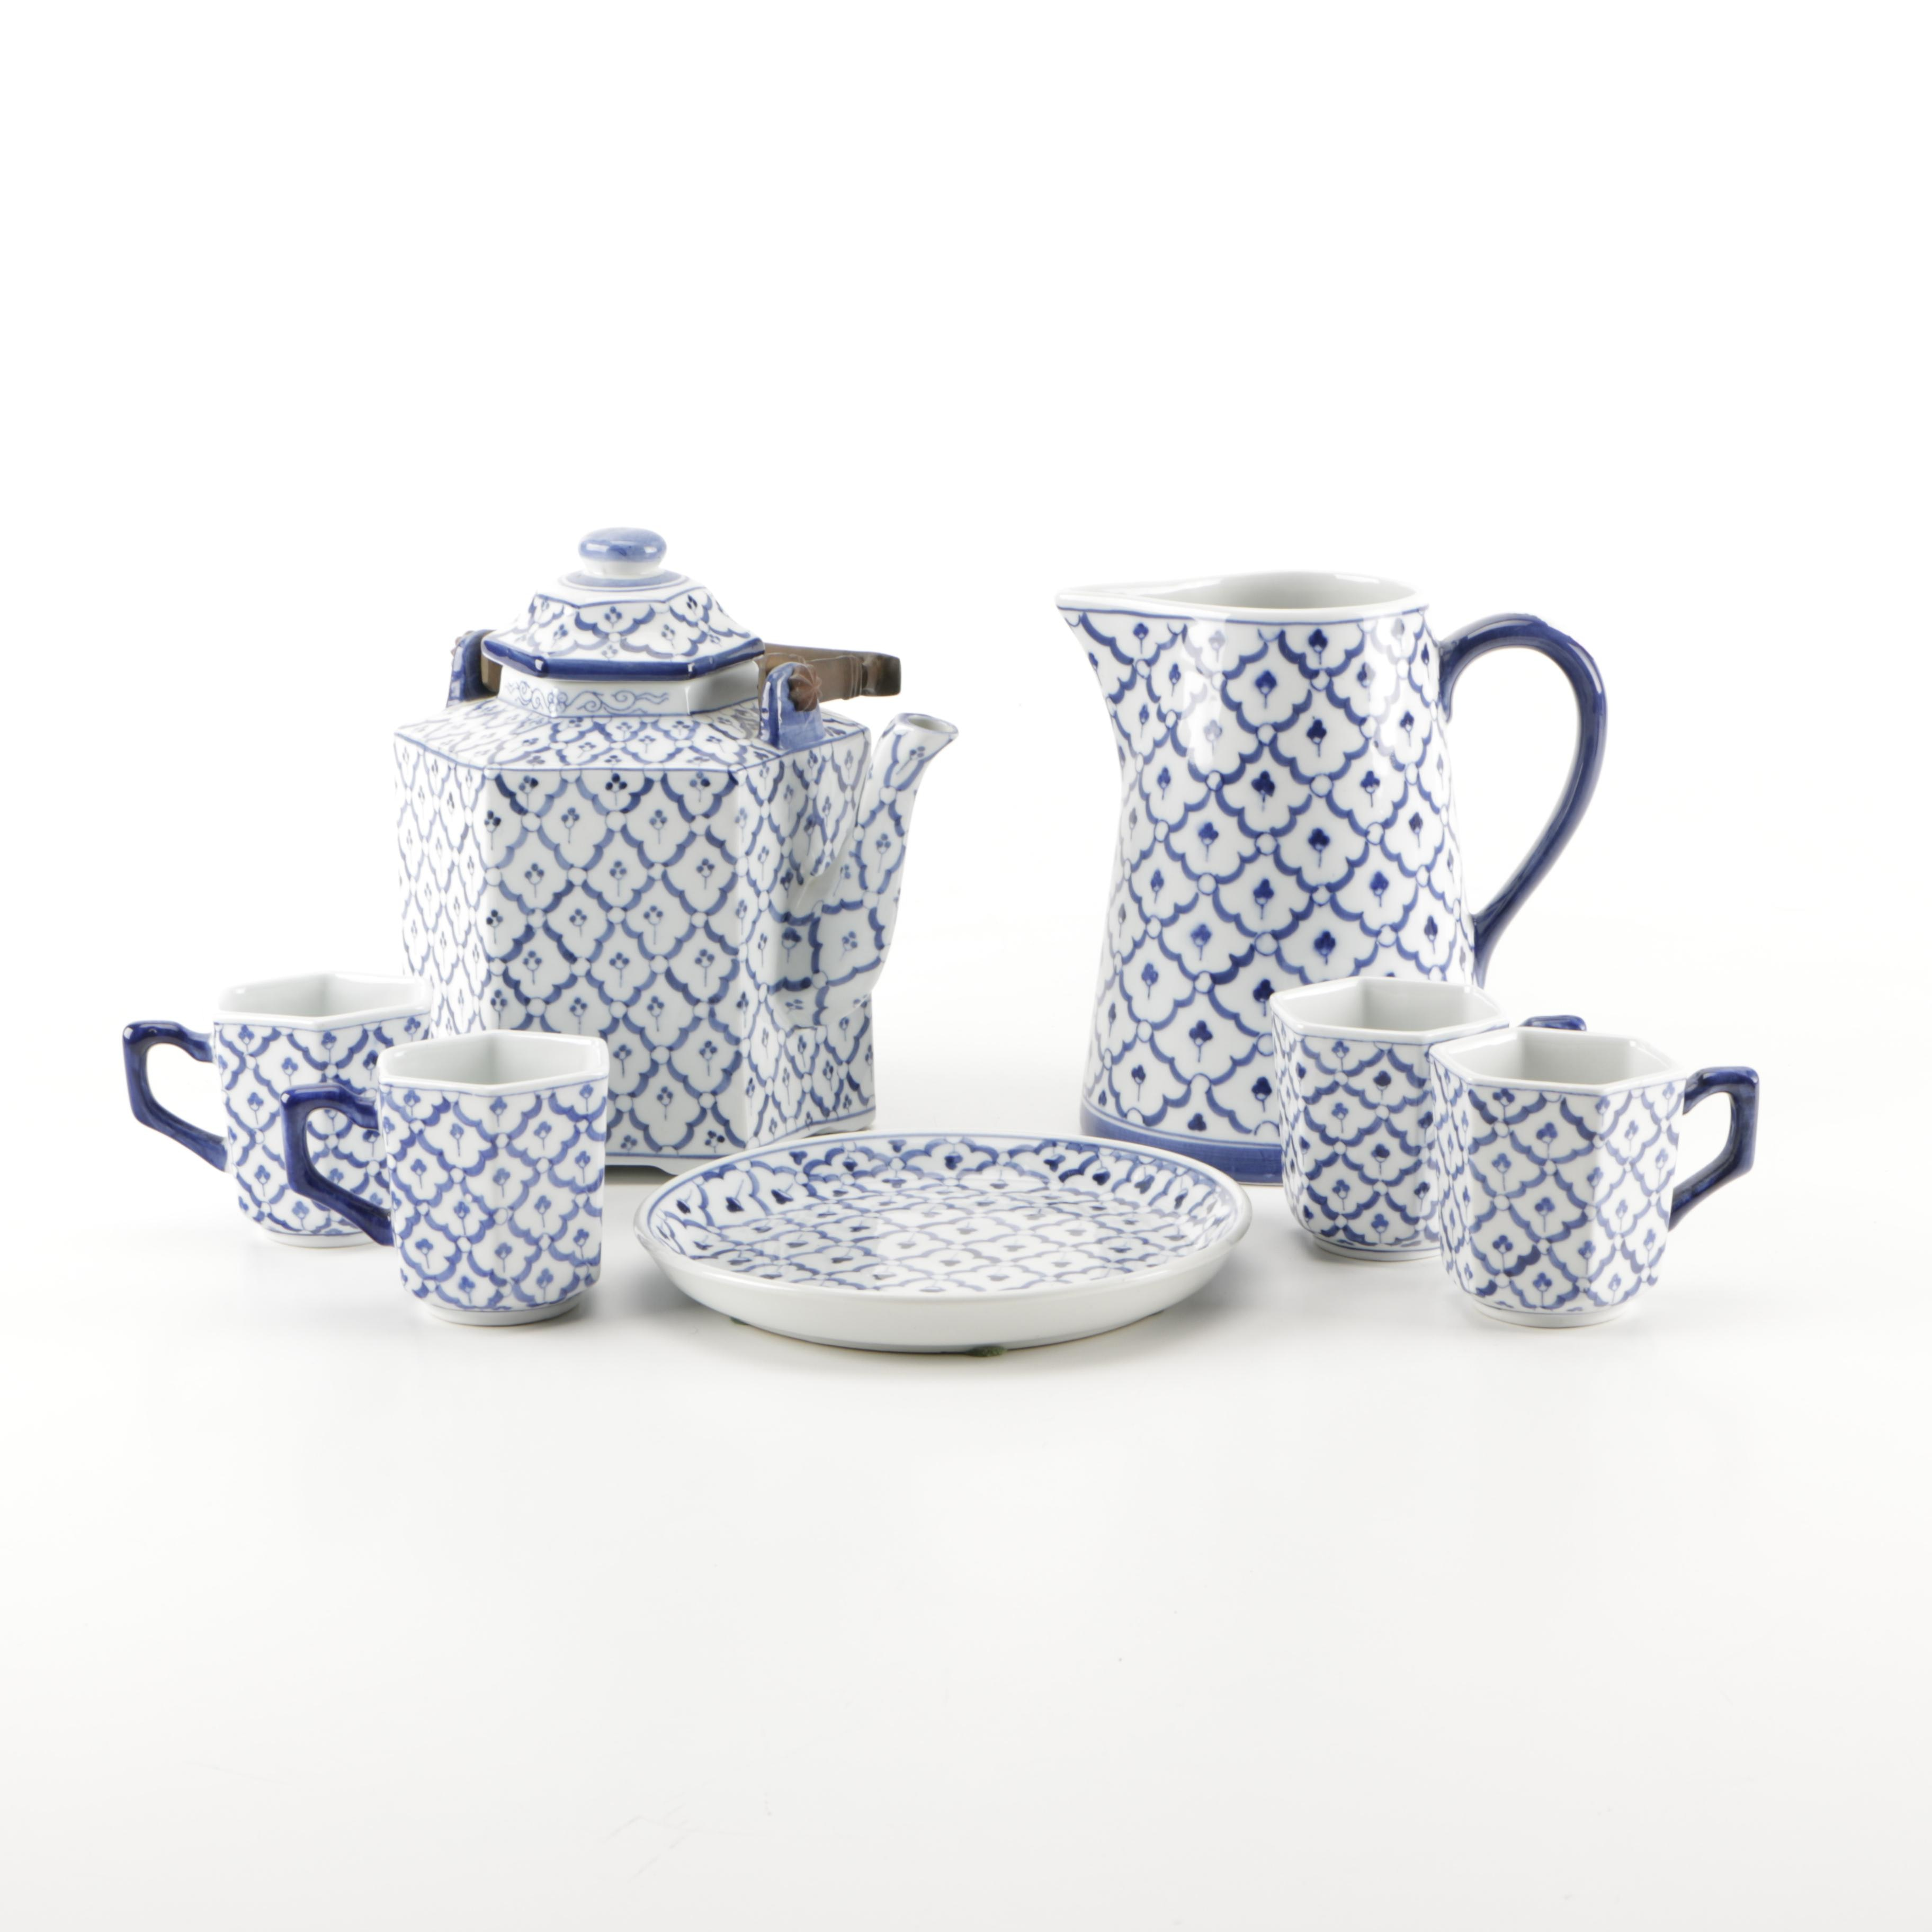 White and Blue Tea Service